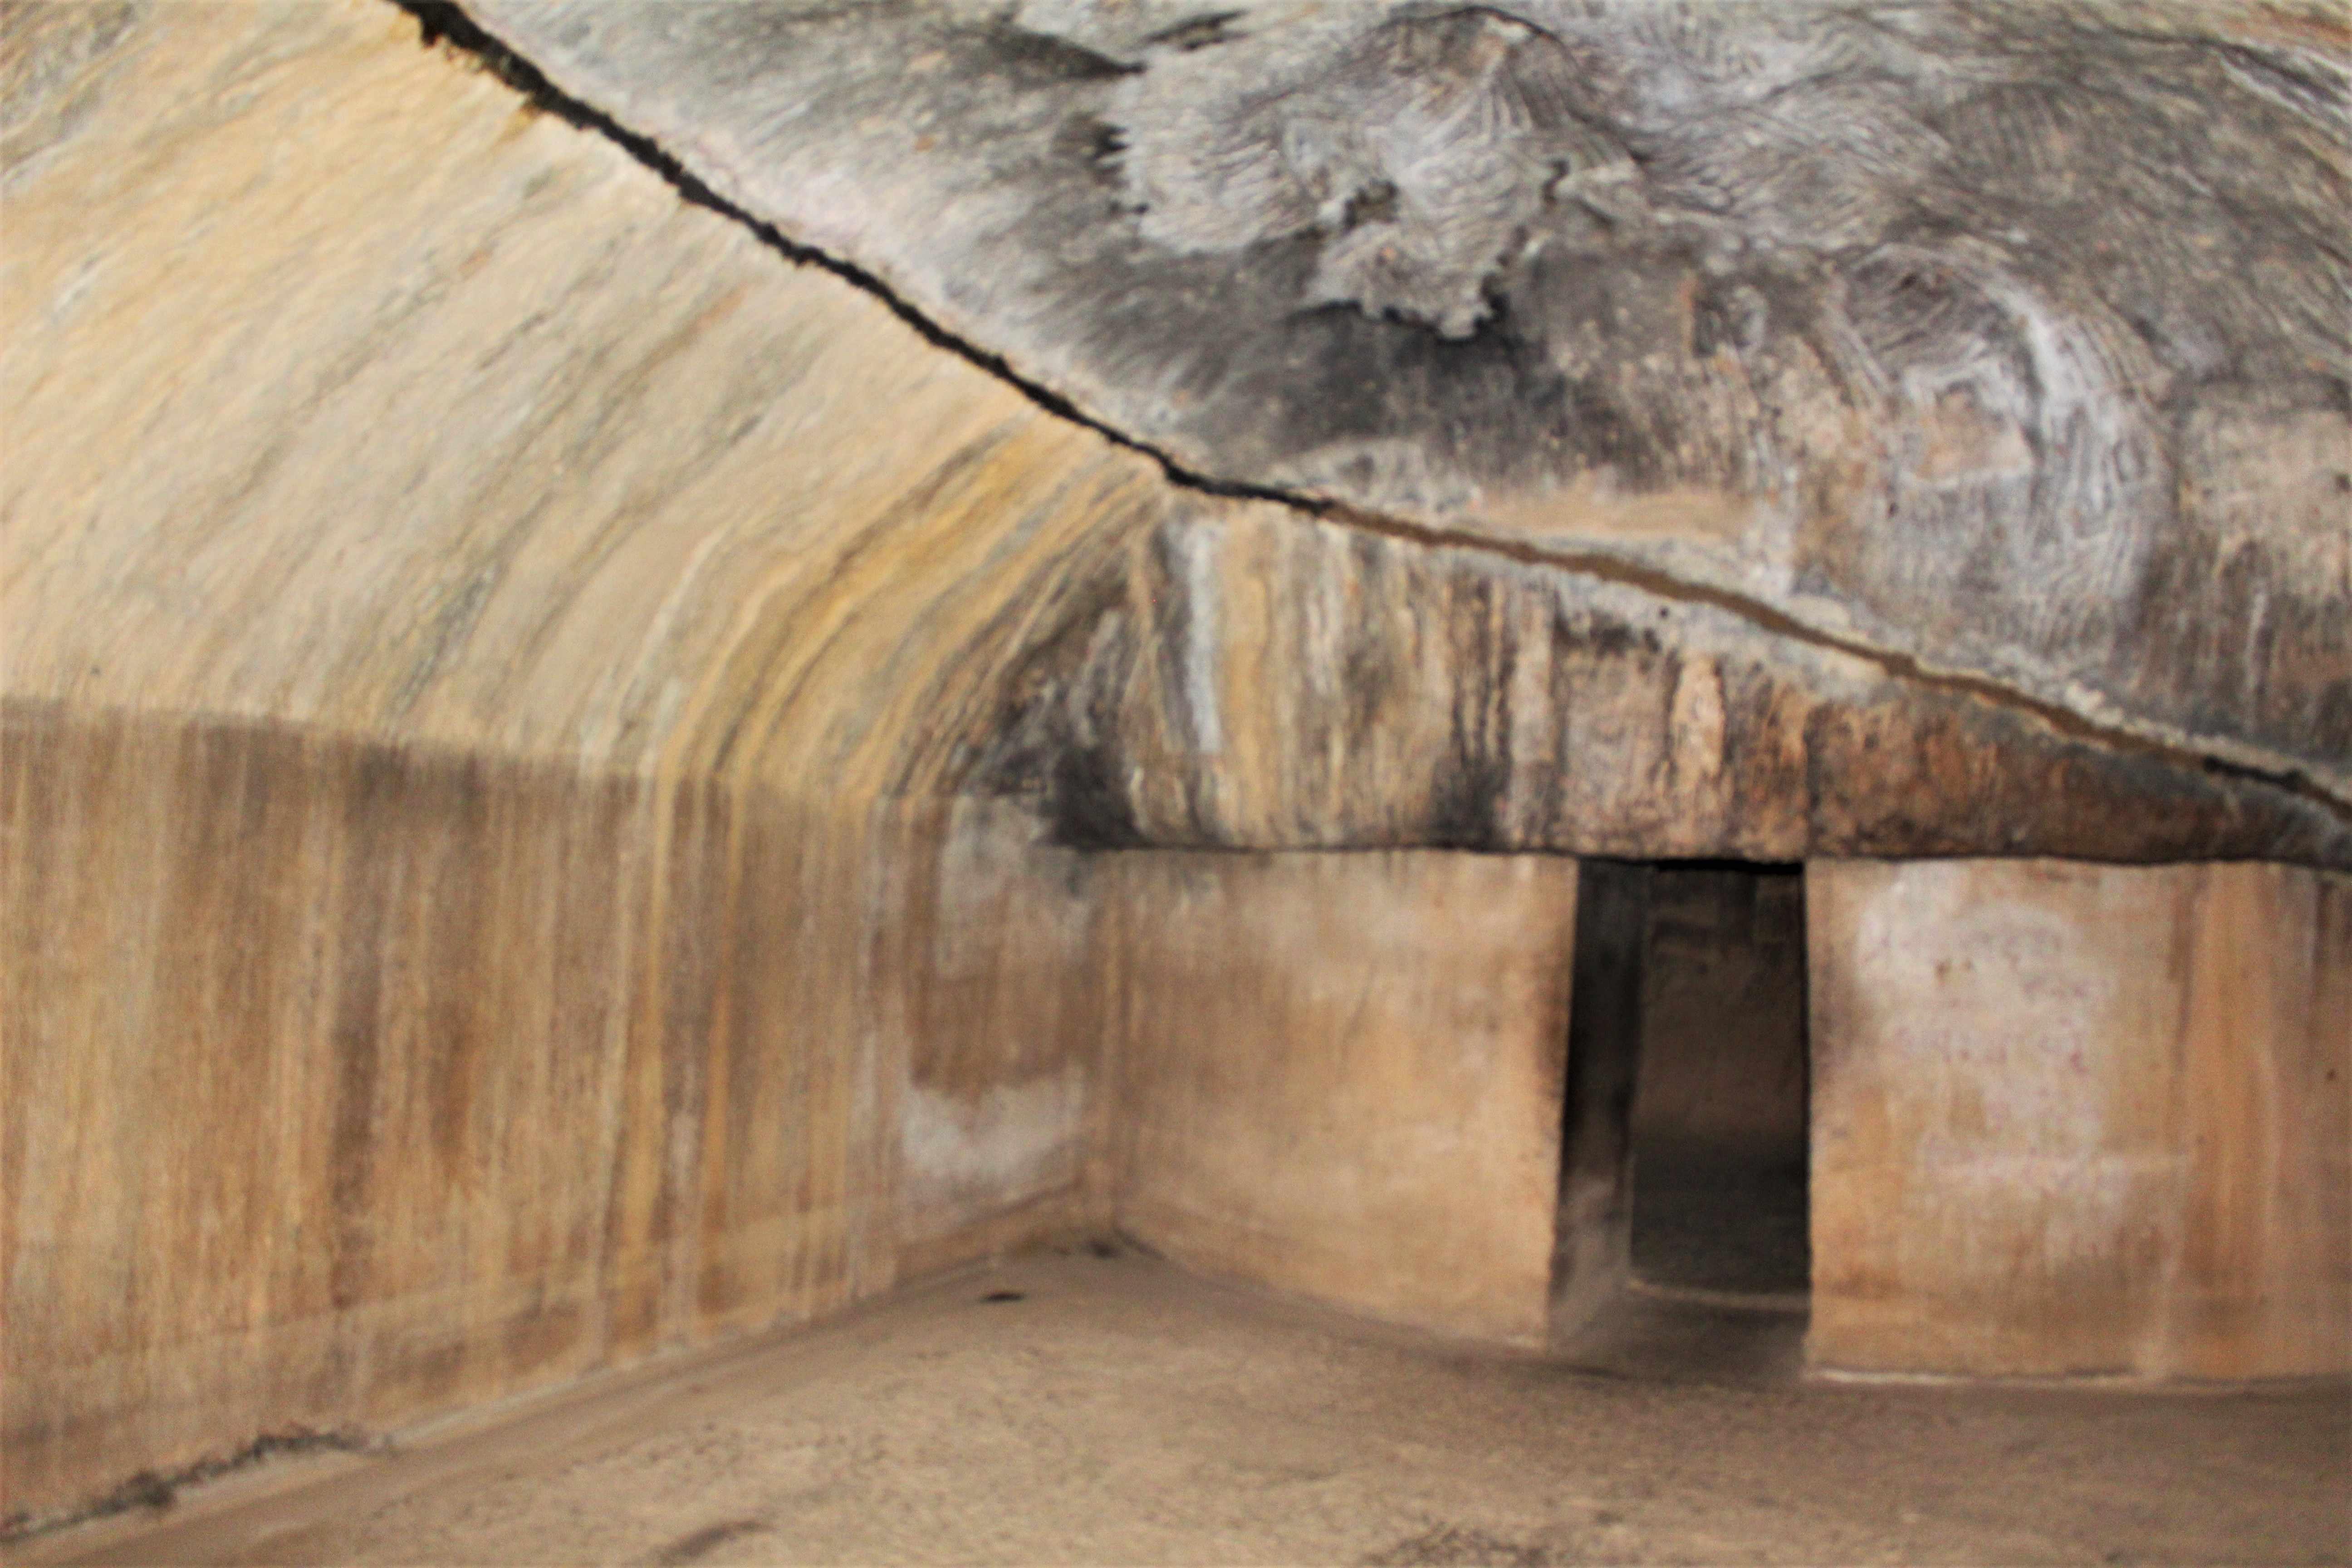 Inside Lomas Rishi Cave